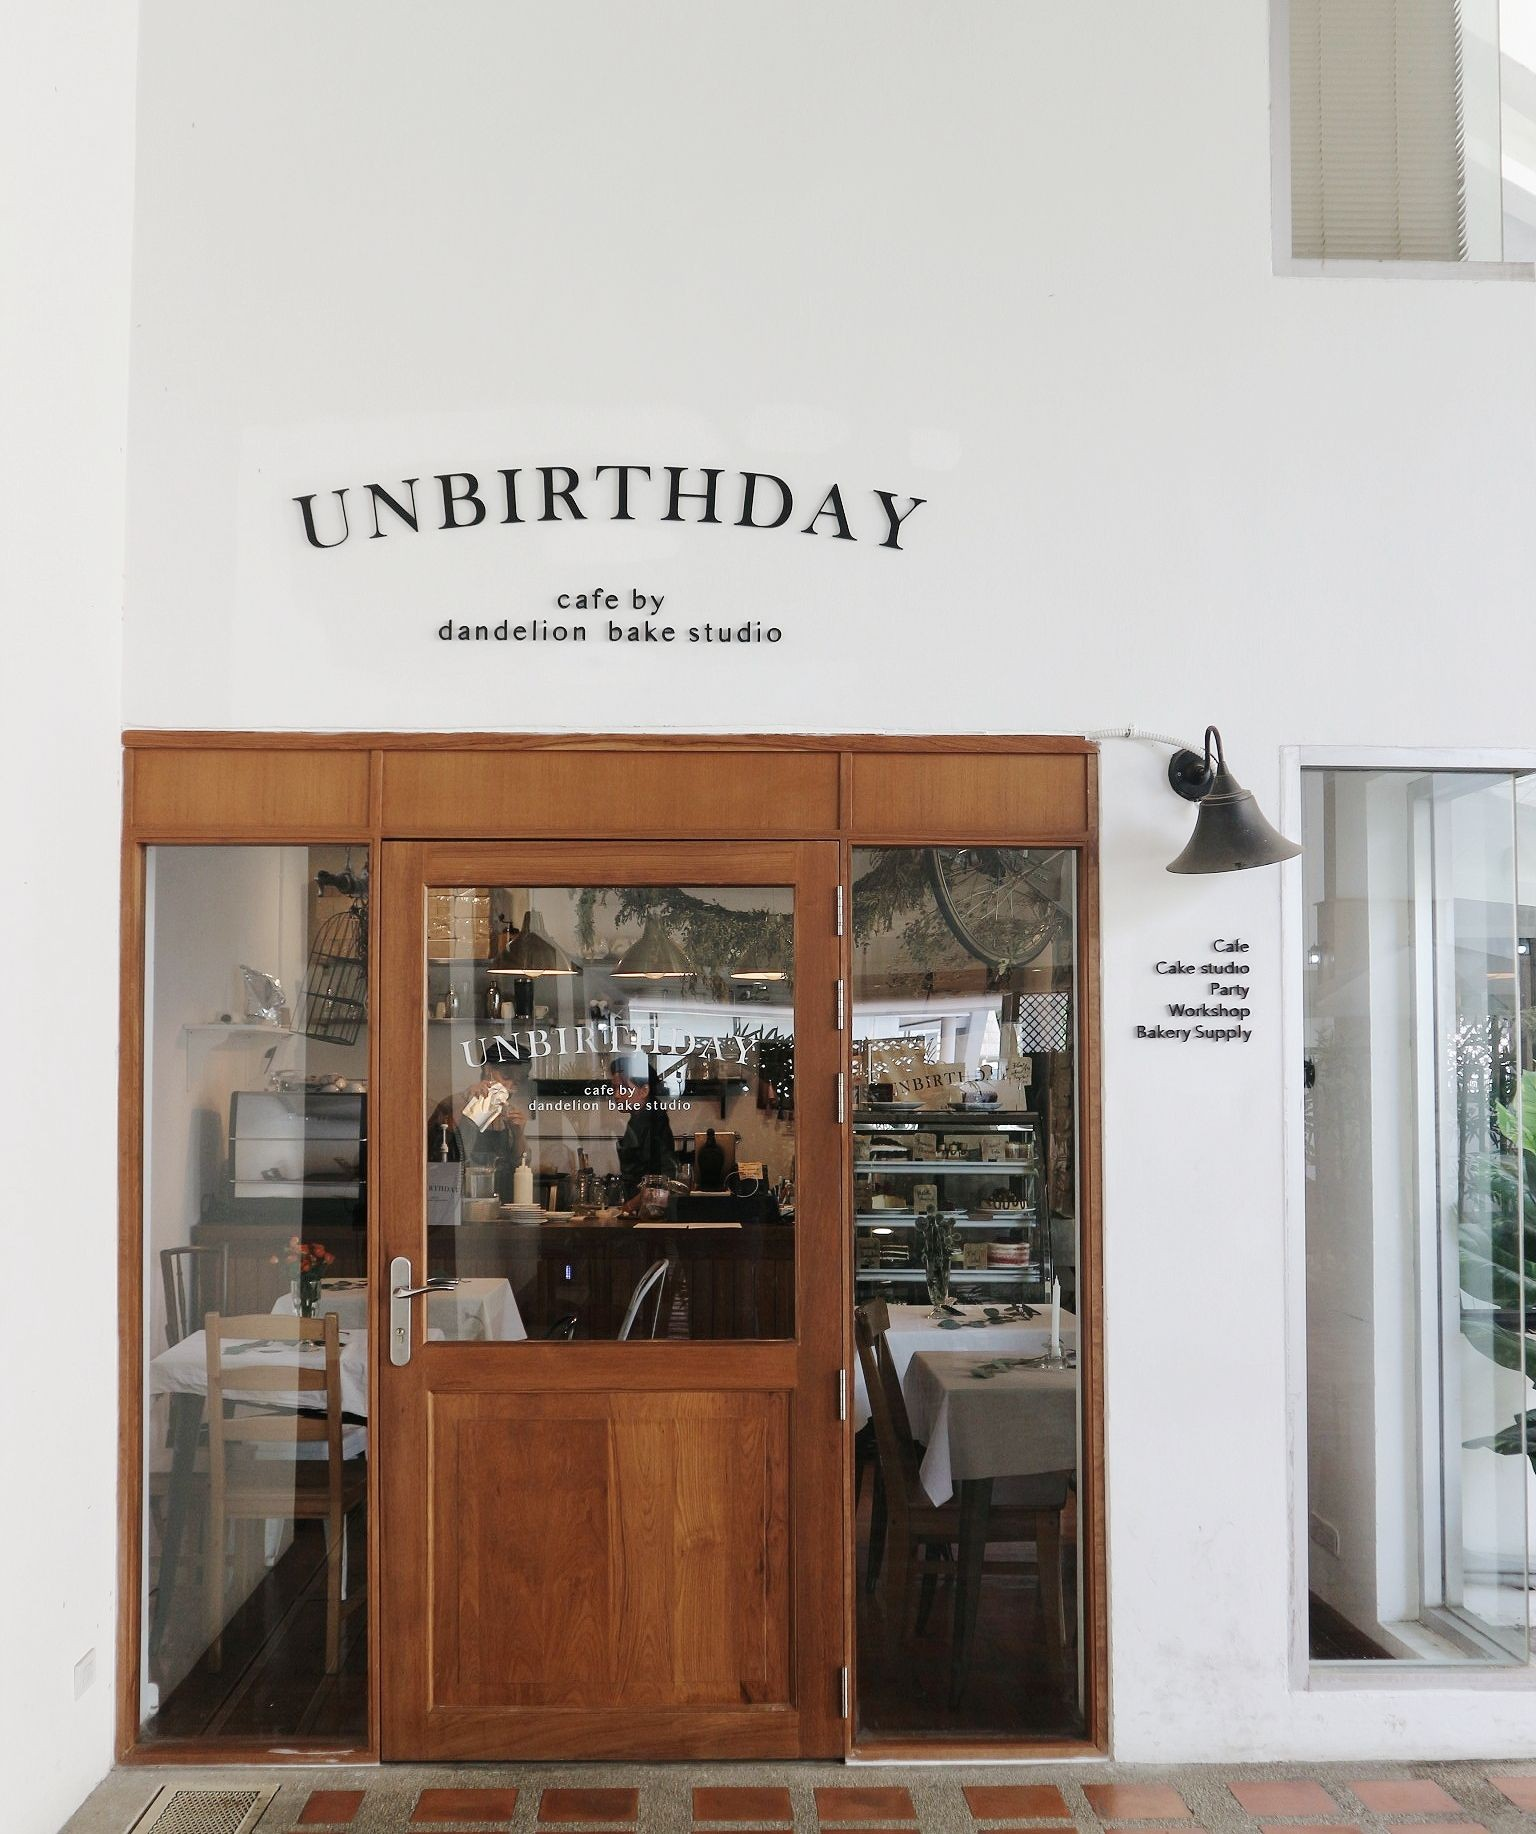 Unbirthday cafe